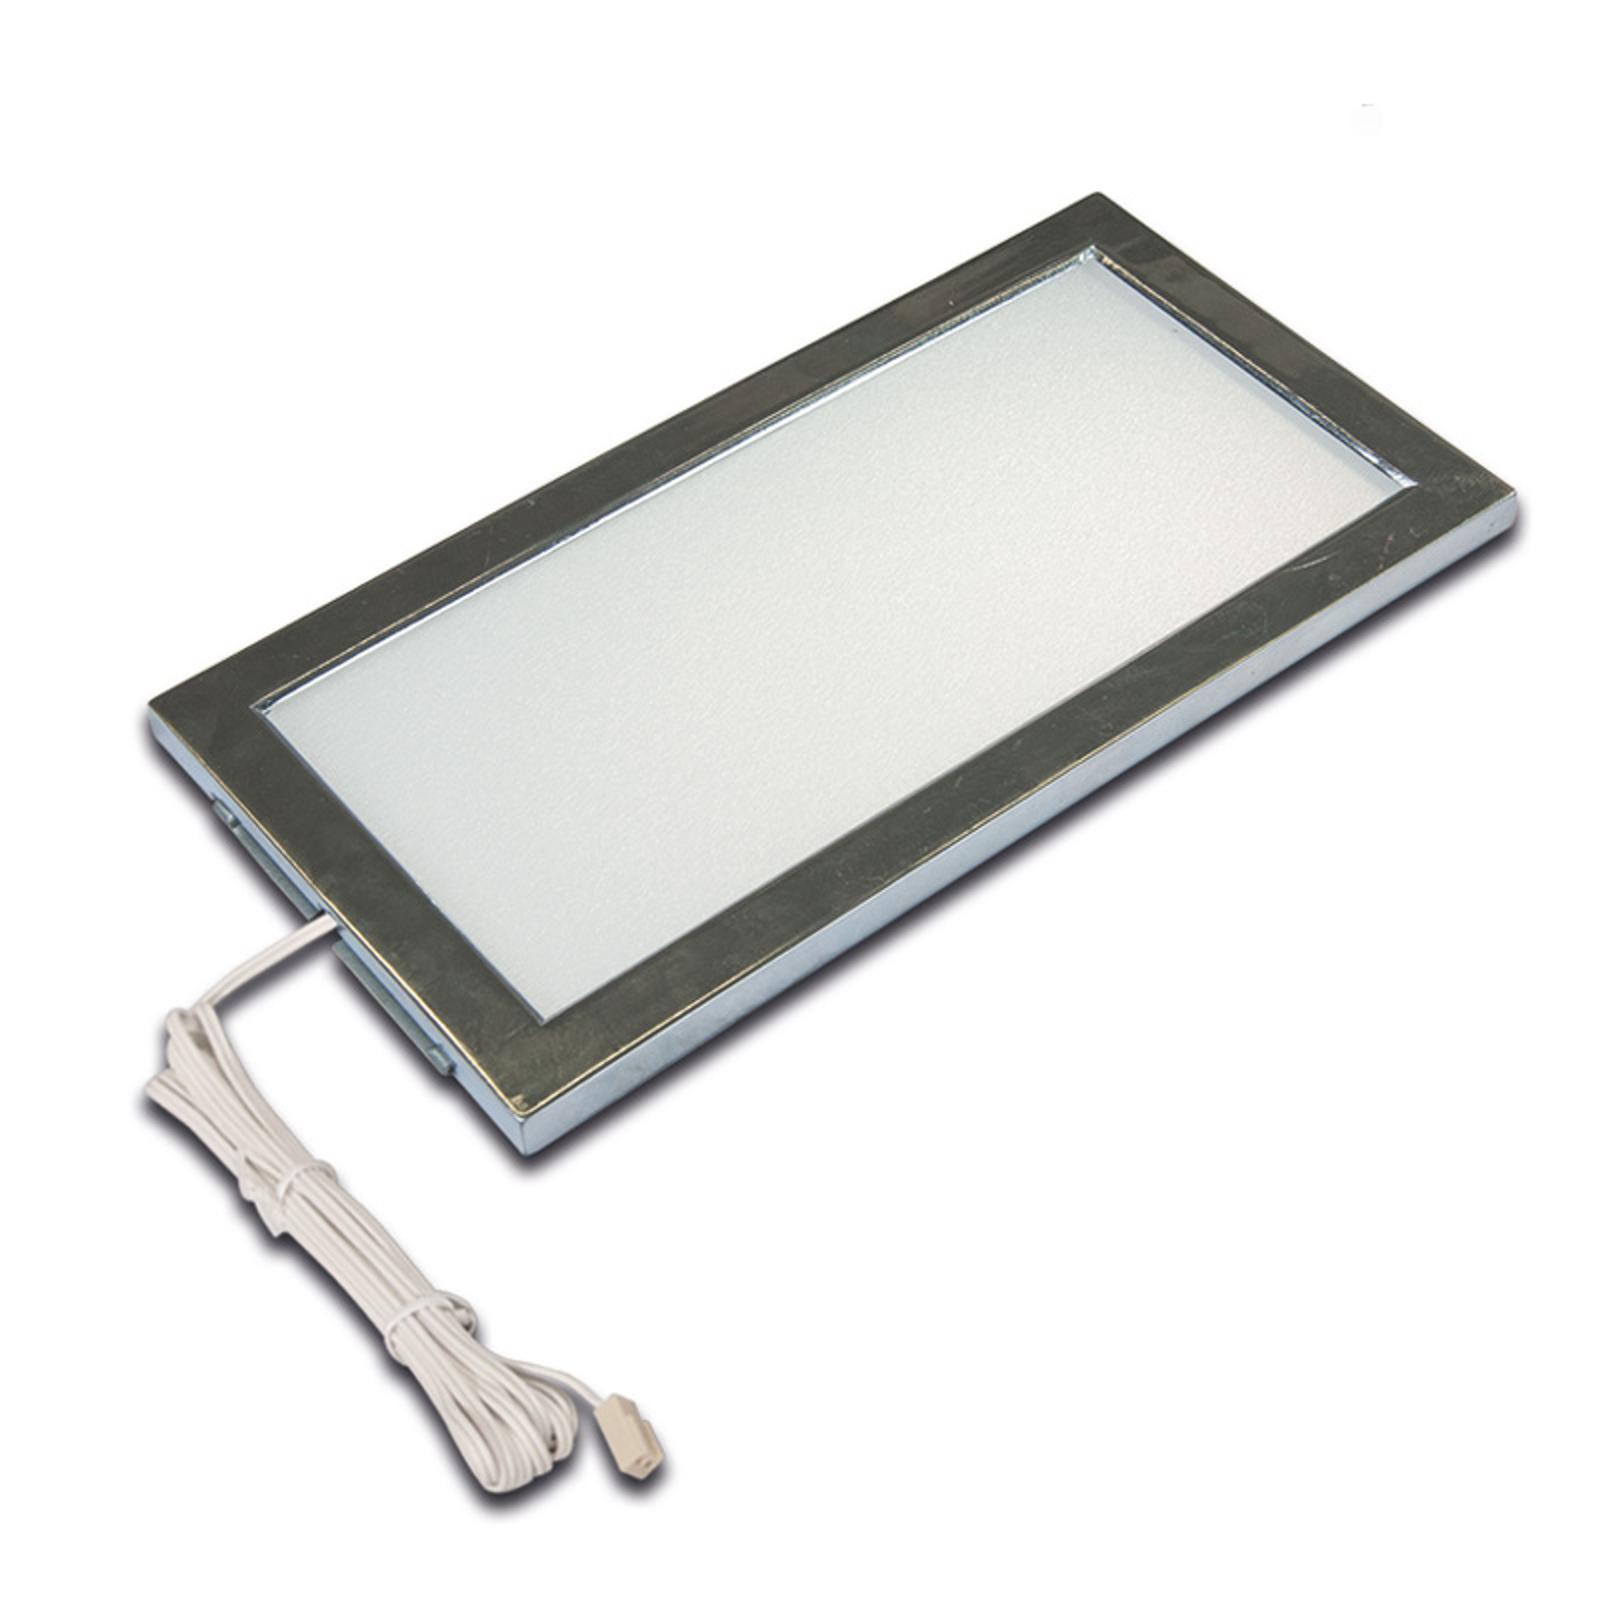 LED-bänklampa Sky rostfritt stål 4 000 K